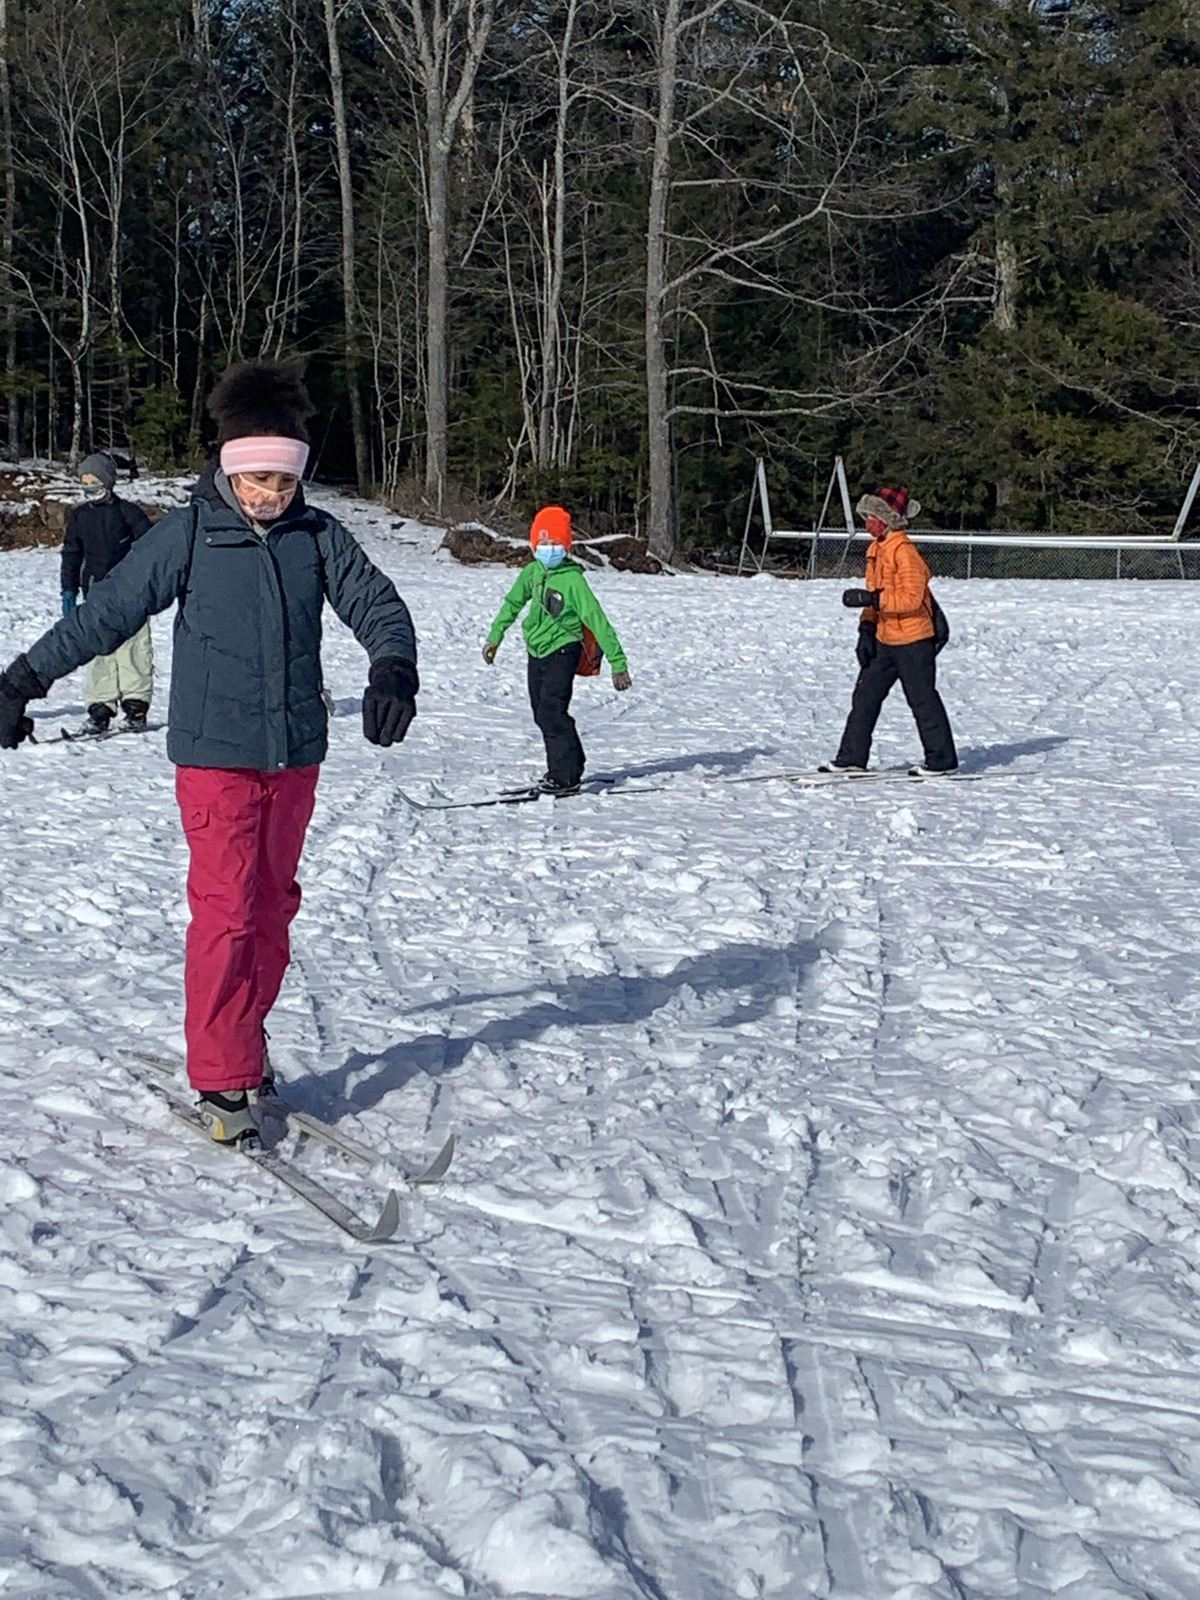 5th Grade Dedham 2 Week 2 Winter Games 2021 Moment of the Week